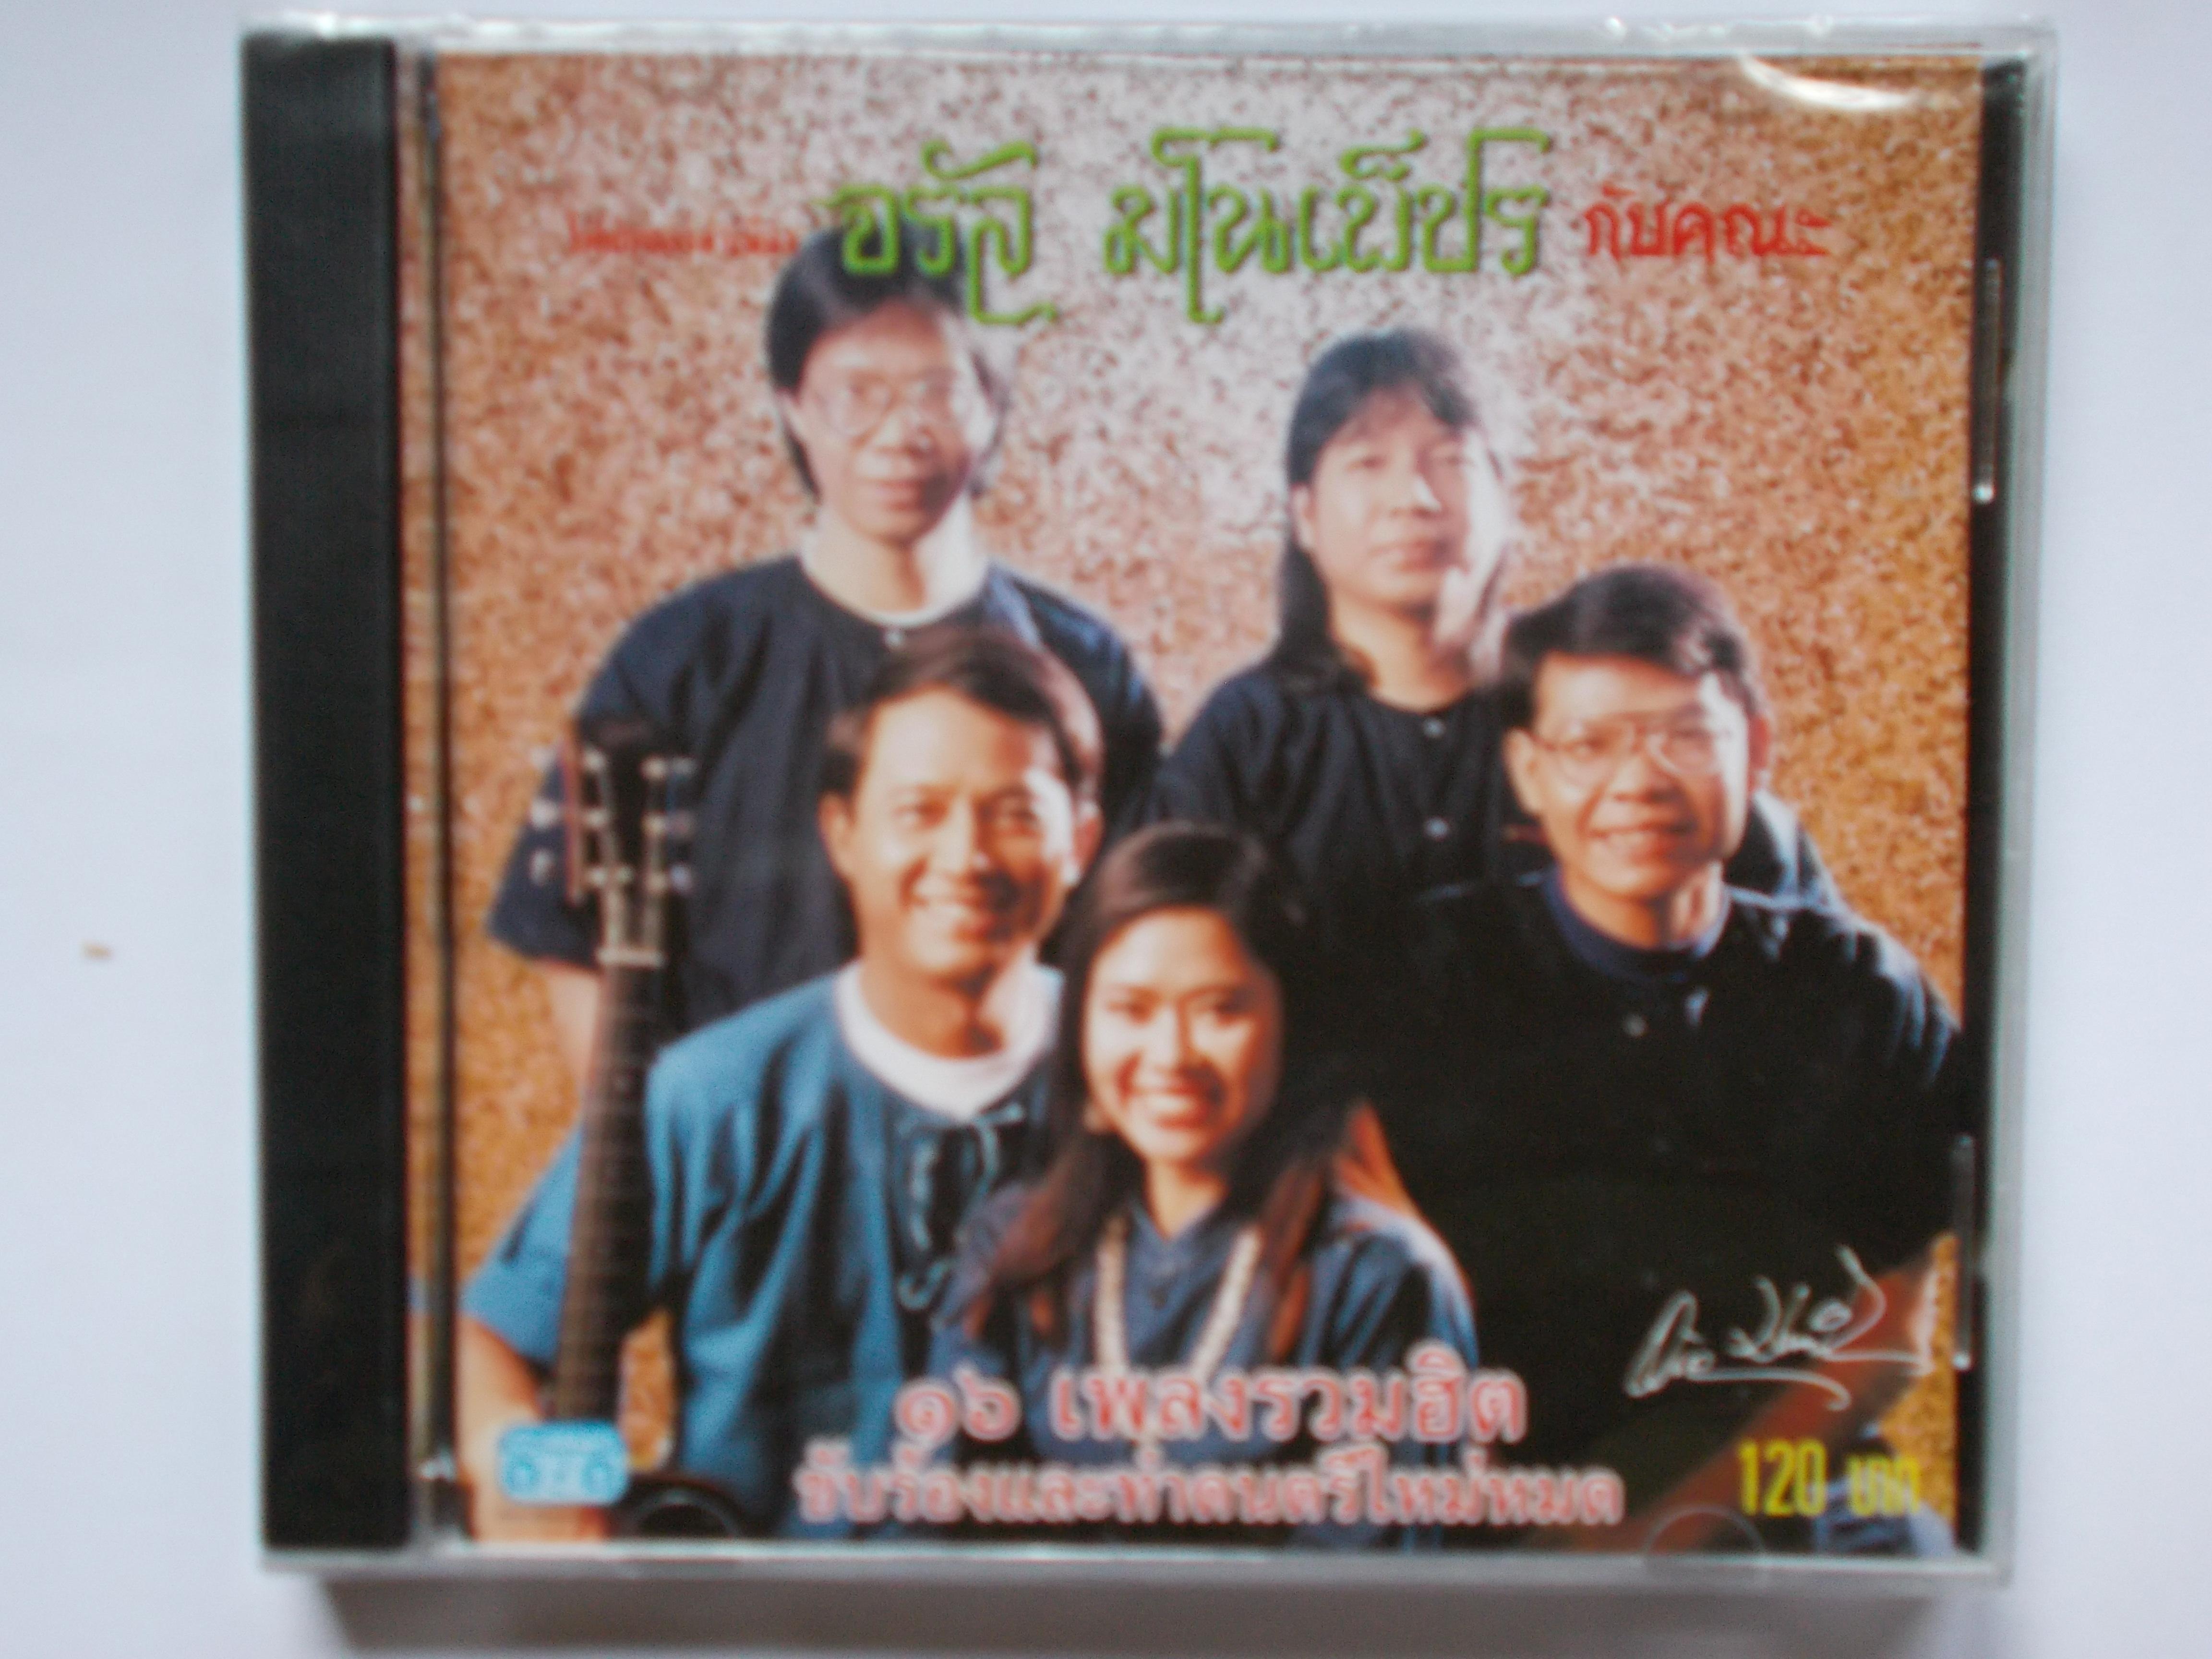 (P3USD+SHIP4USD) CD เพลง จรัล มโนเพ็ชร อัลบั้ม โฟล์คซองคำเมือง